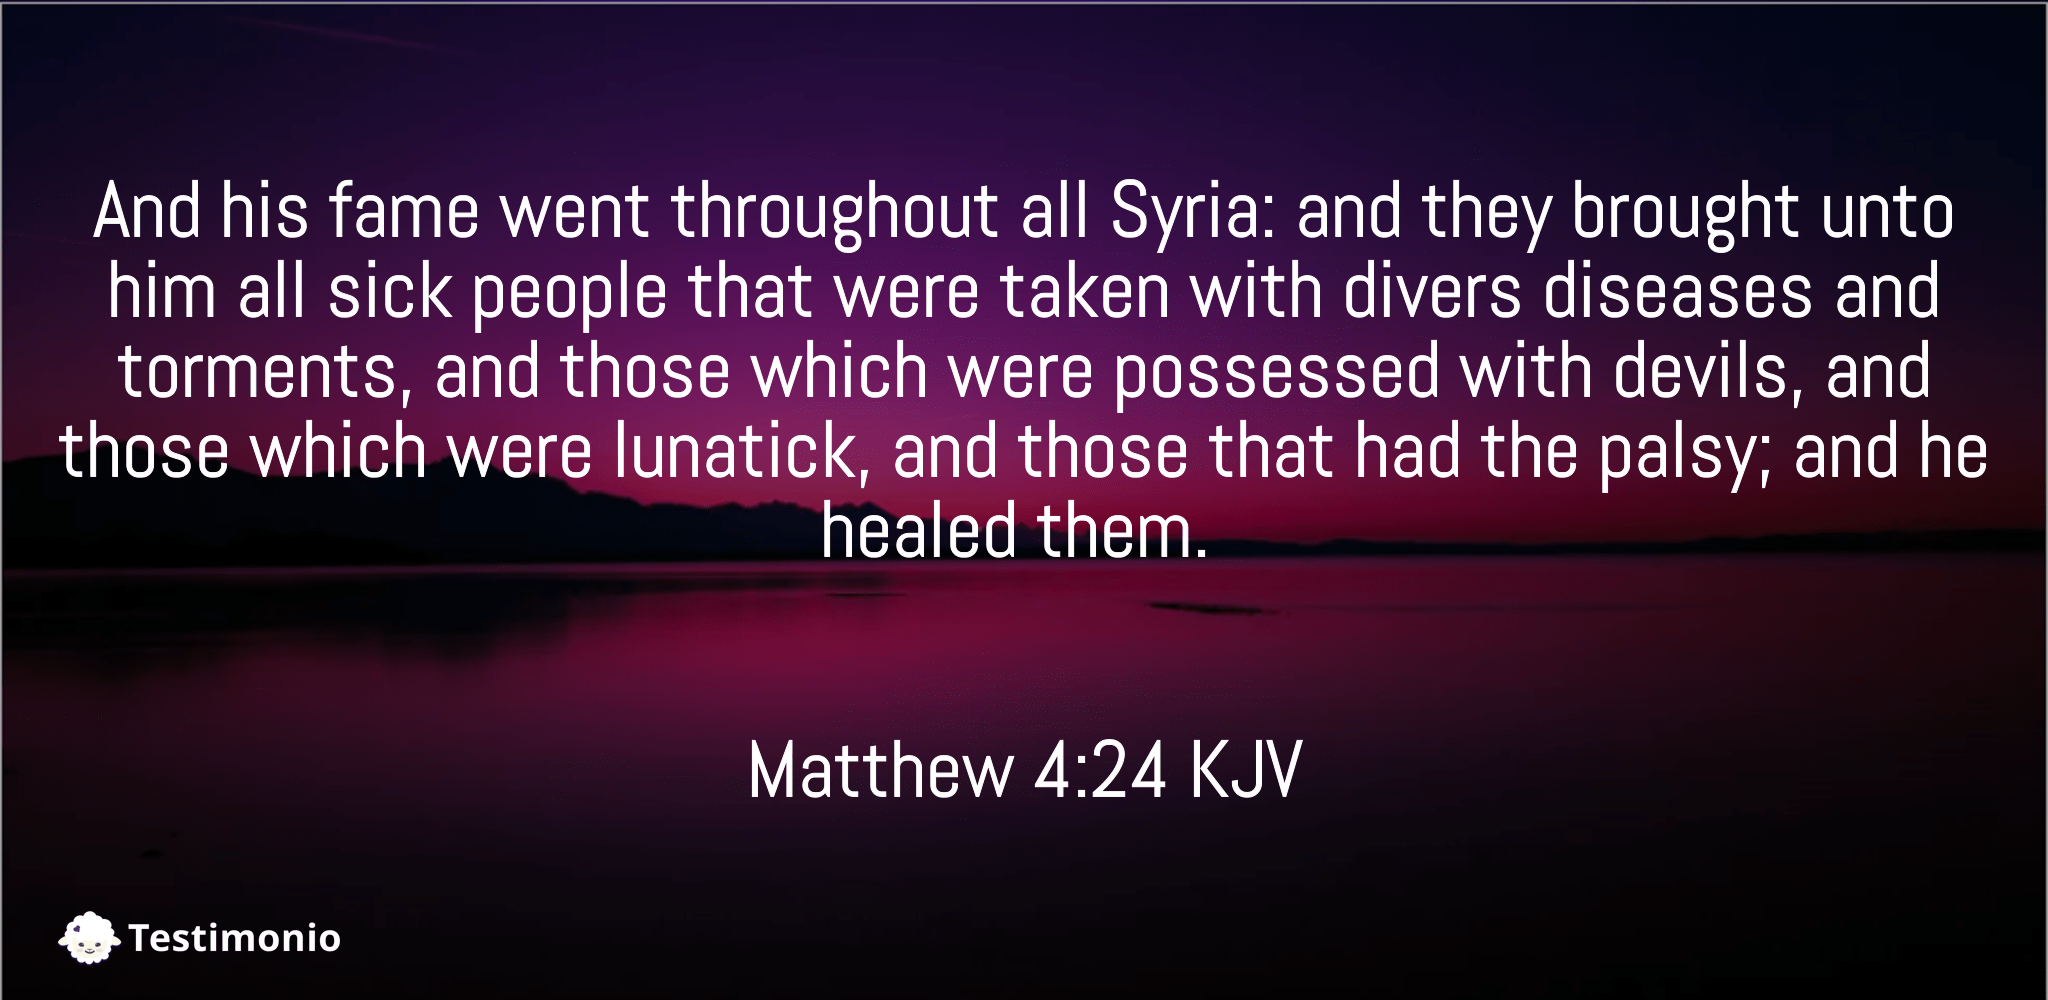 Matthew 4:24